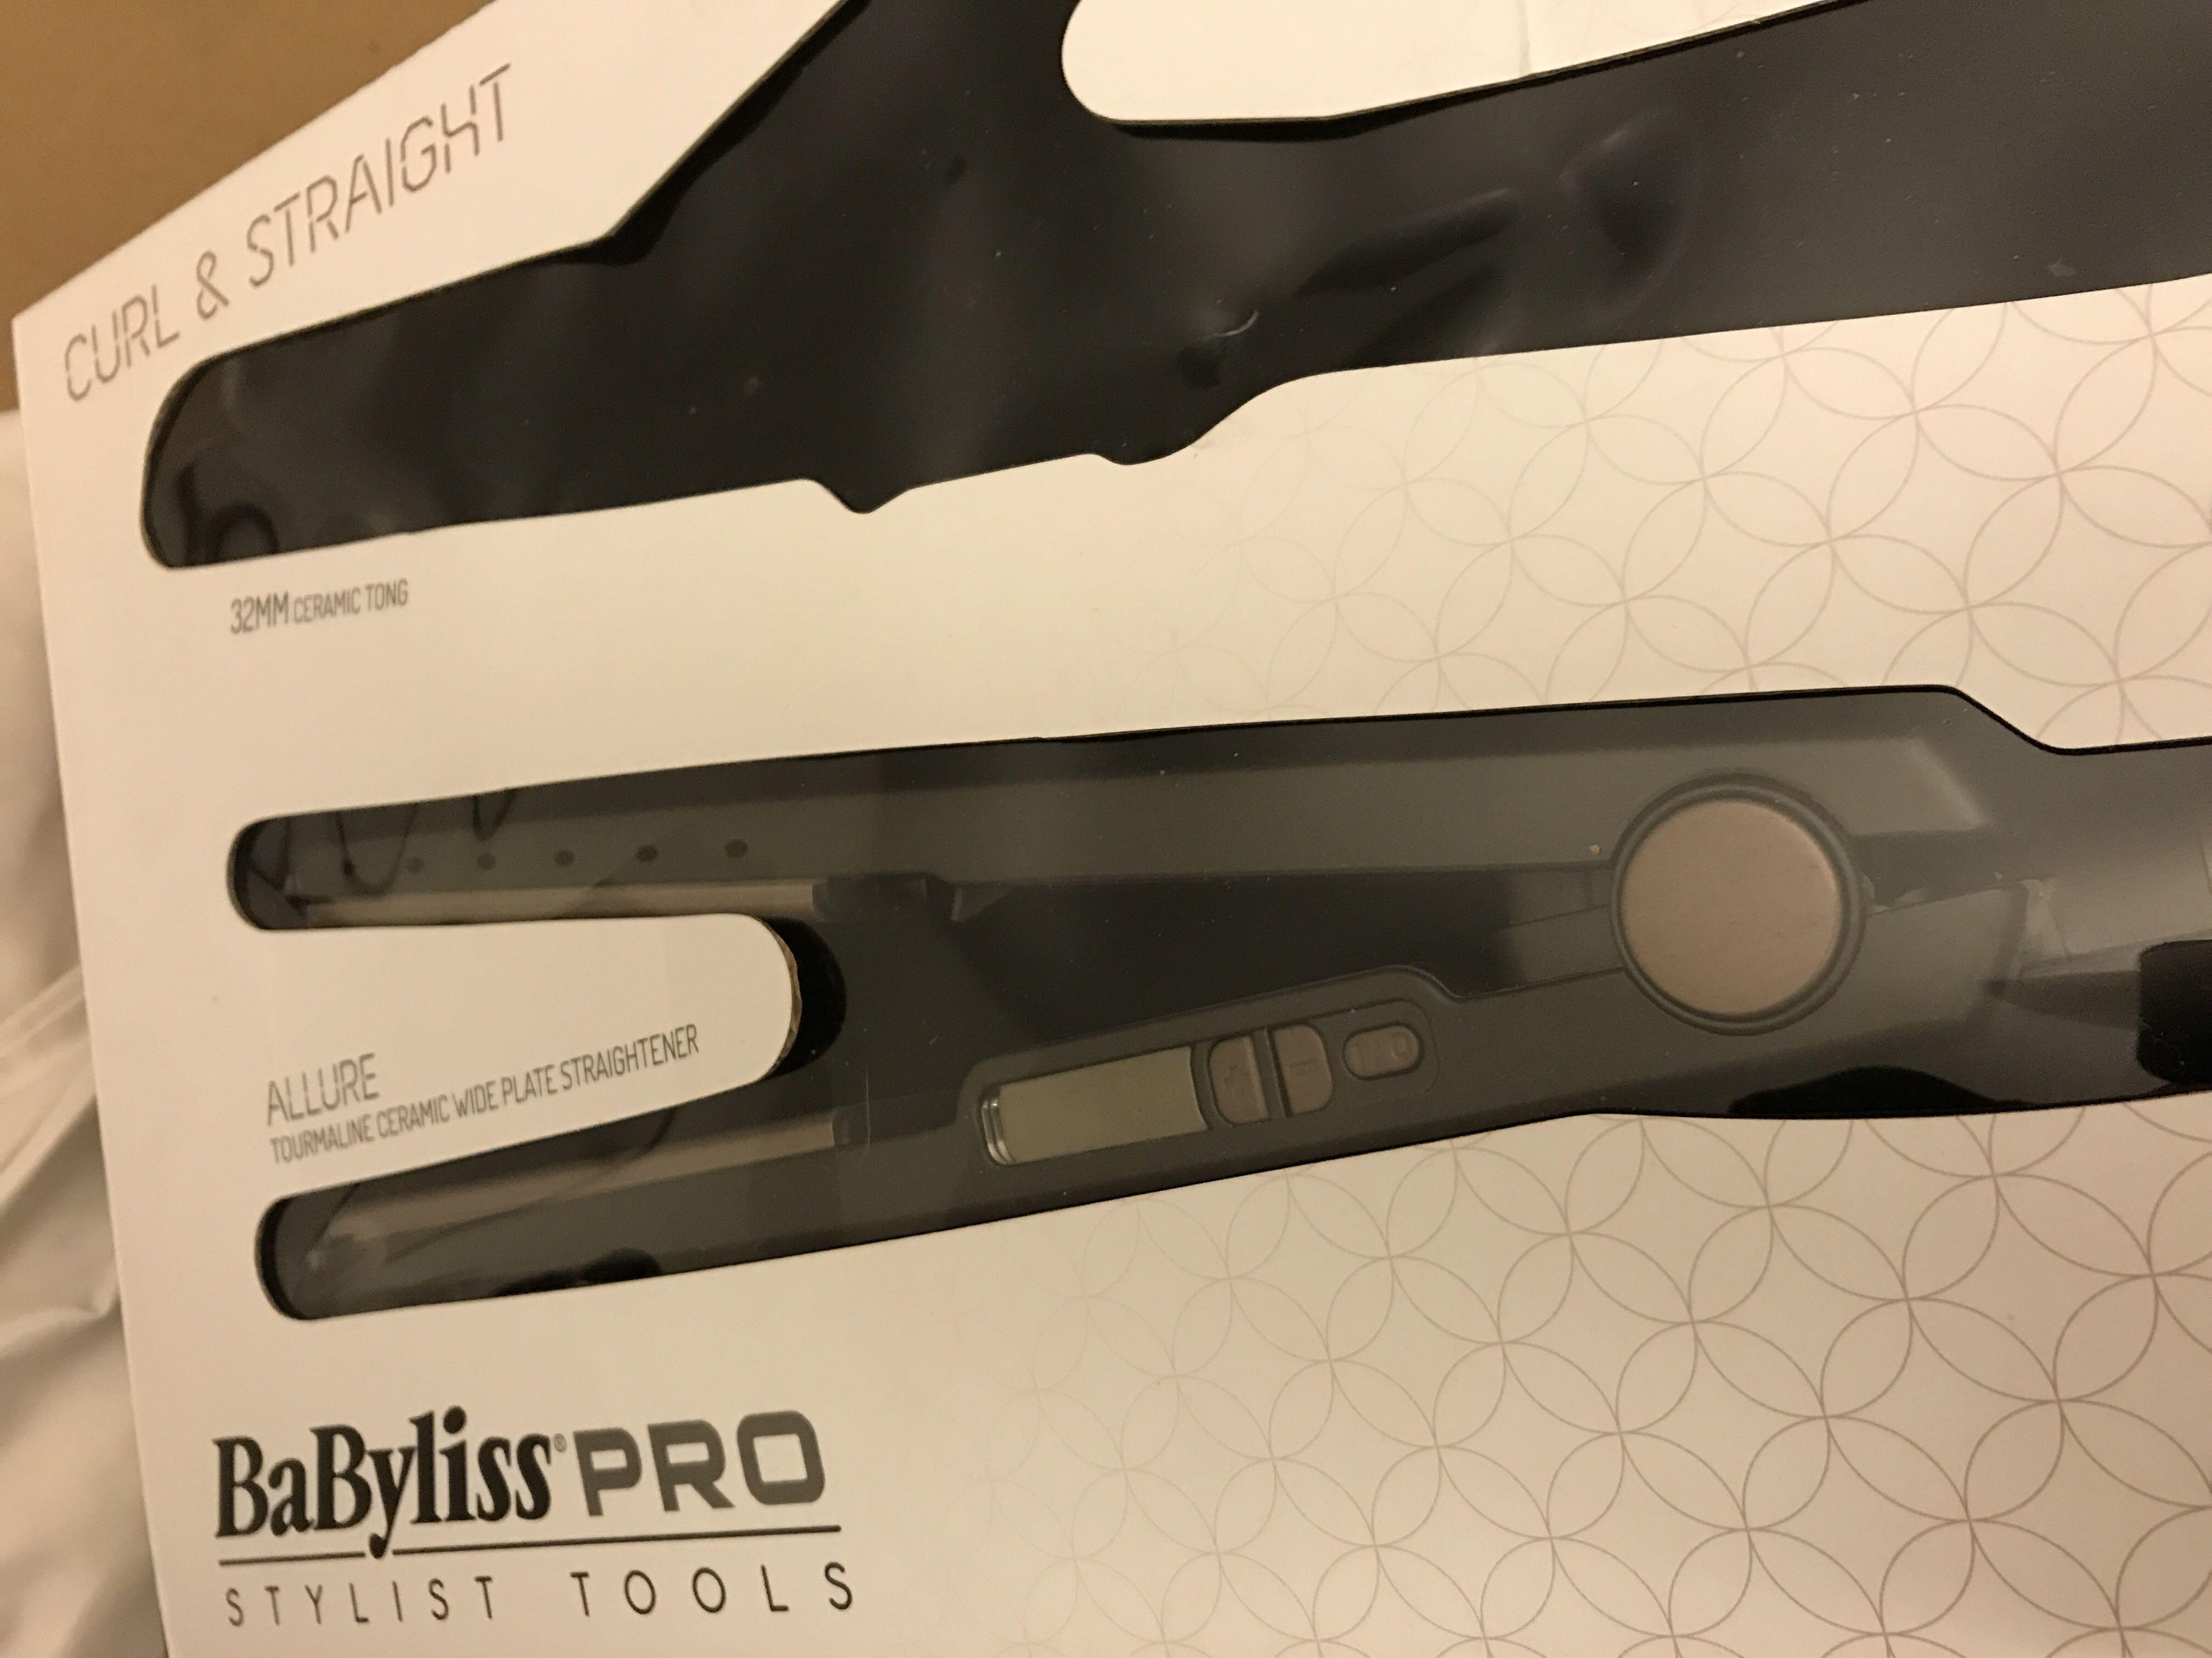 Brand new BaByliss Allure straightener